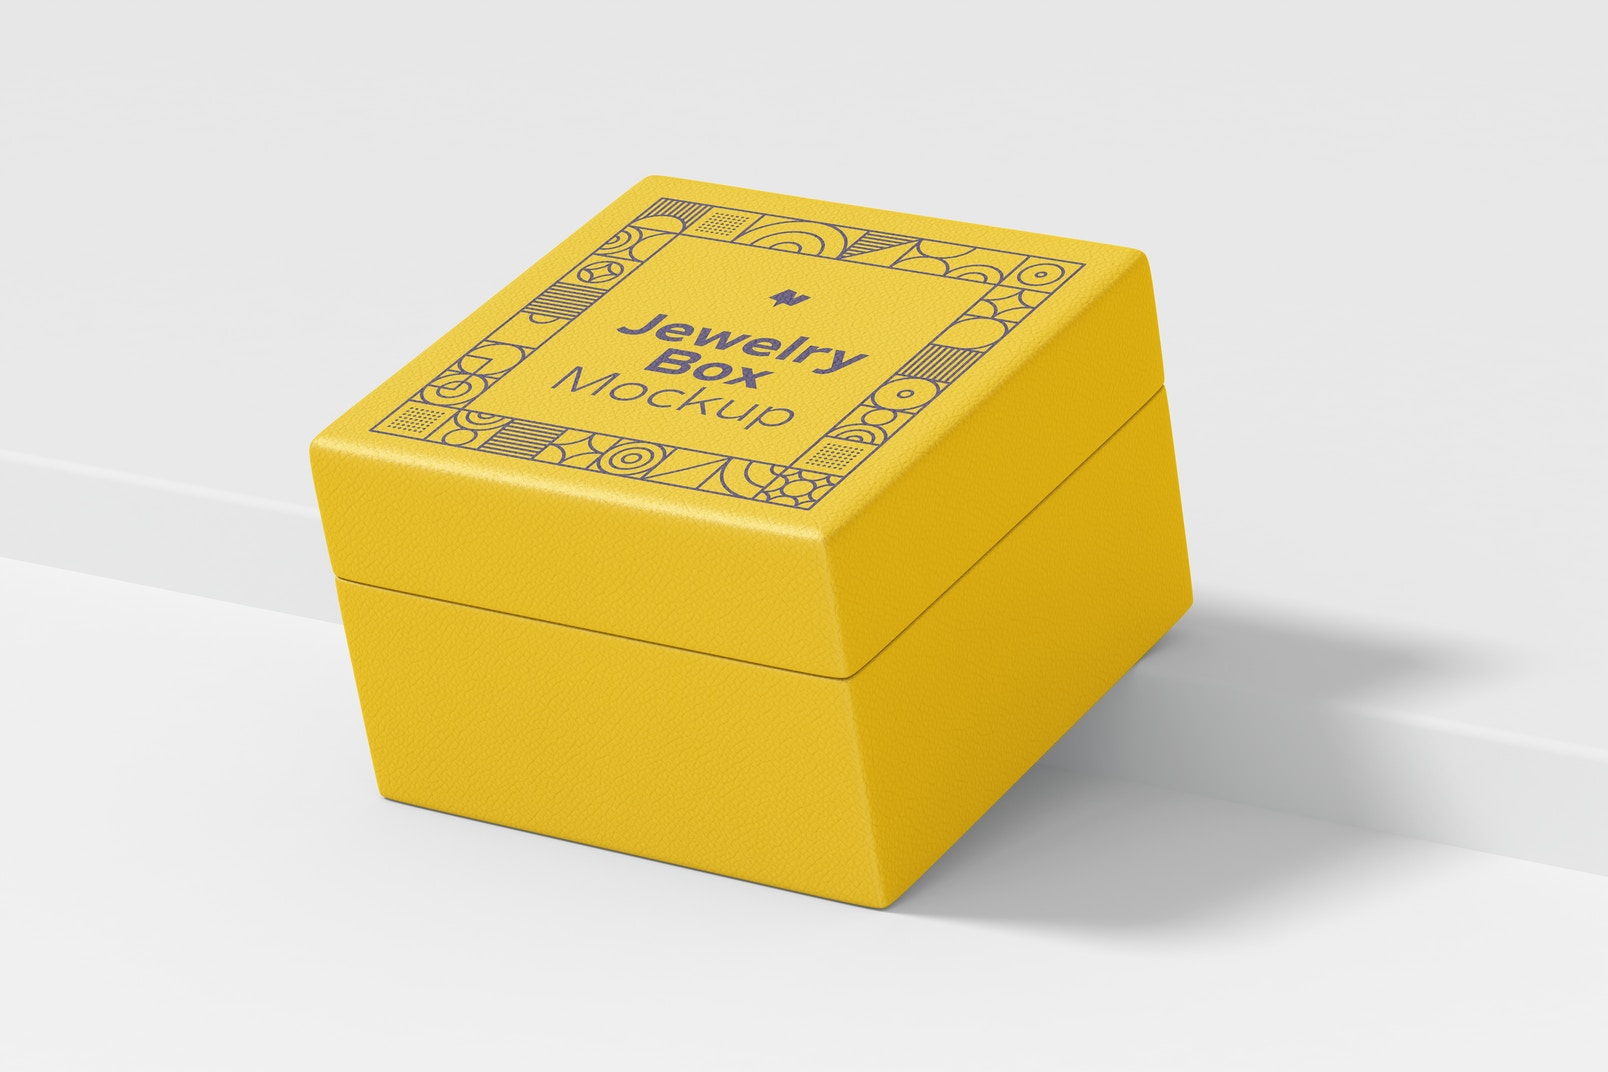 Jewelry Box Mockup, Perspective